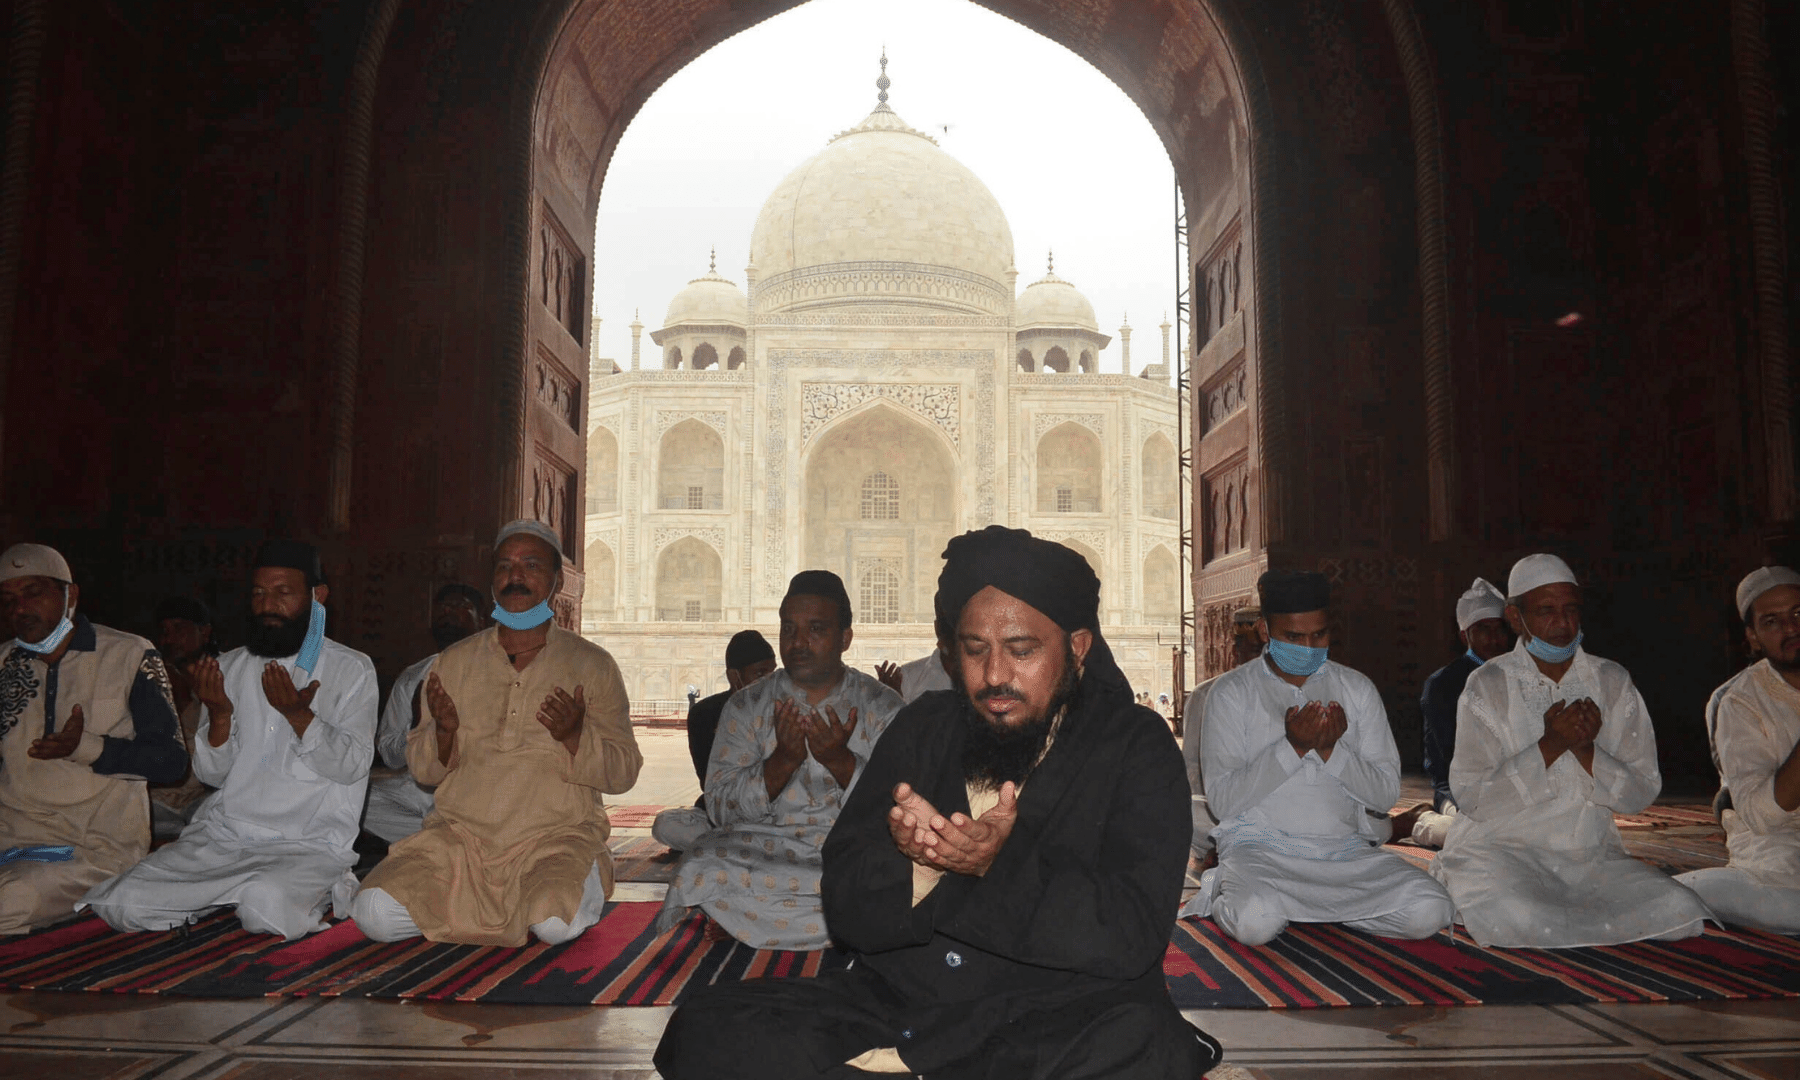 Muslims offer prayers in front of the Taj Mahal on Eidul Azha in Agra, India. — AP